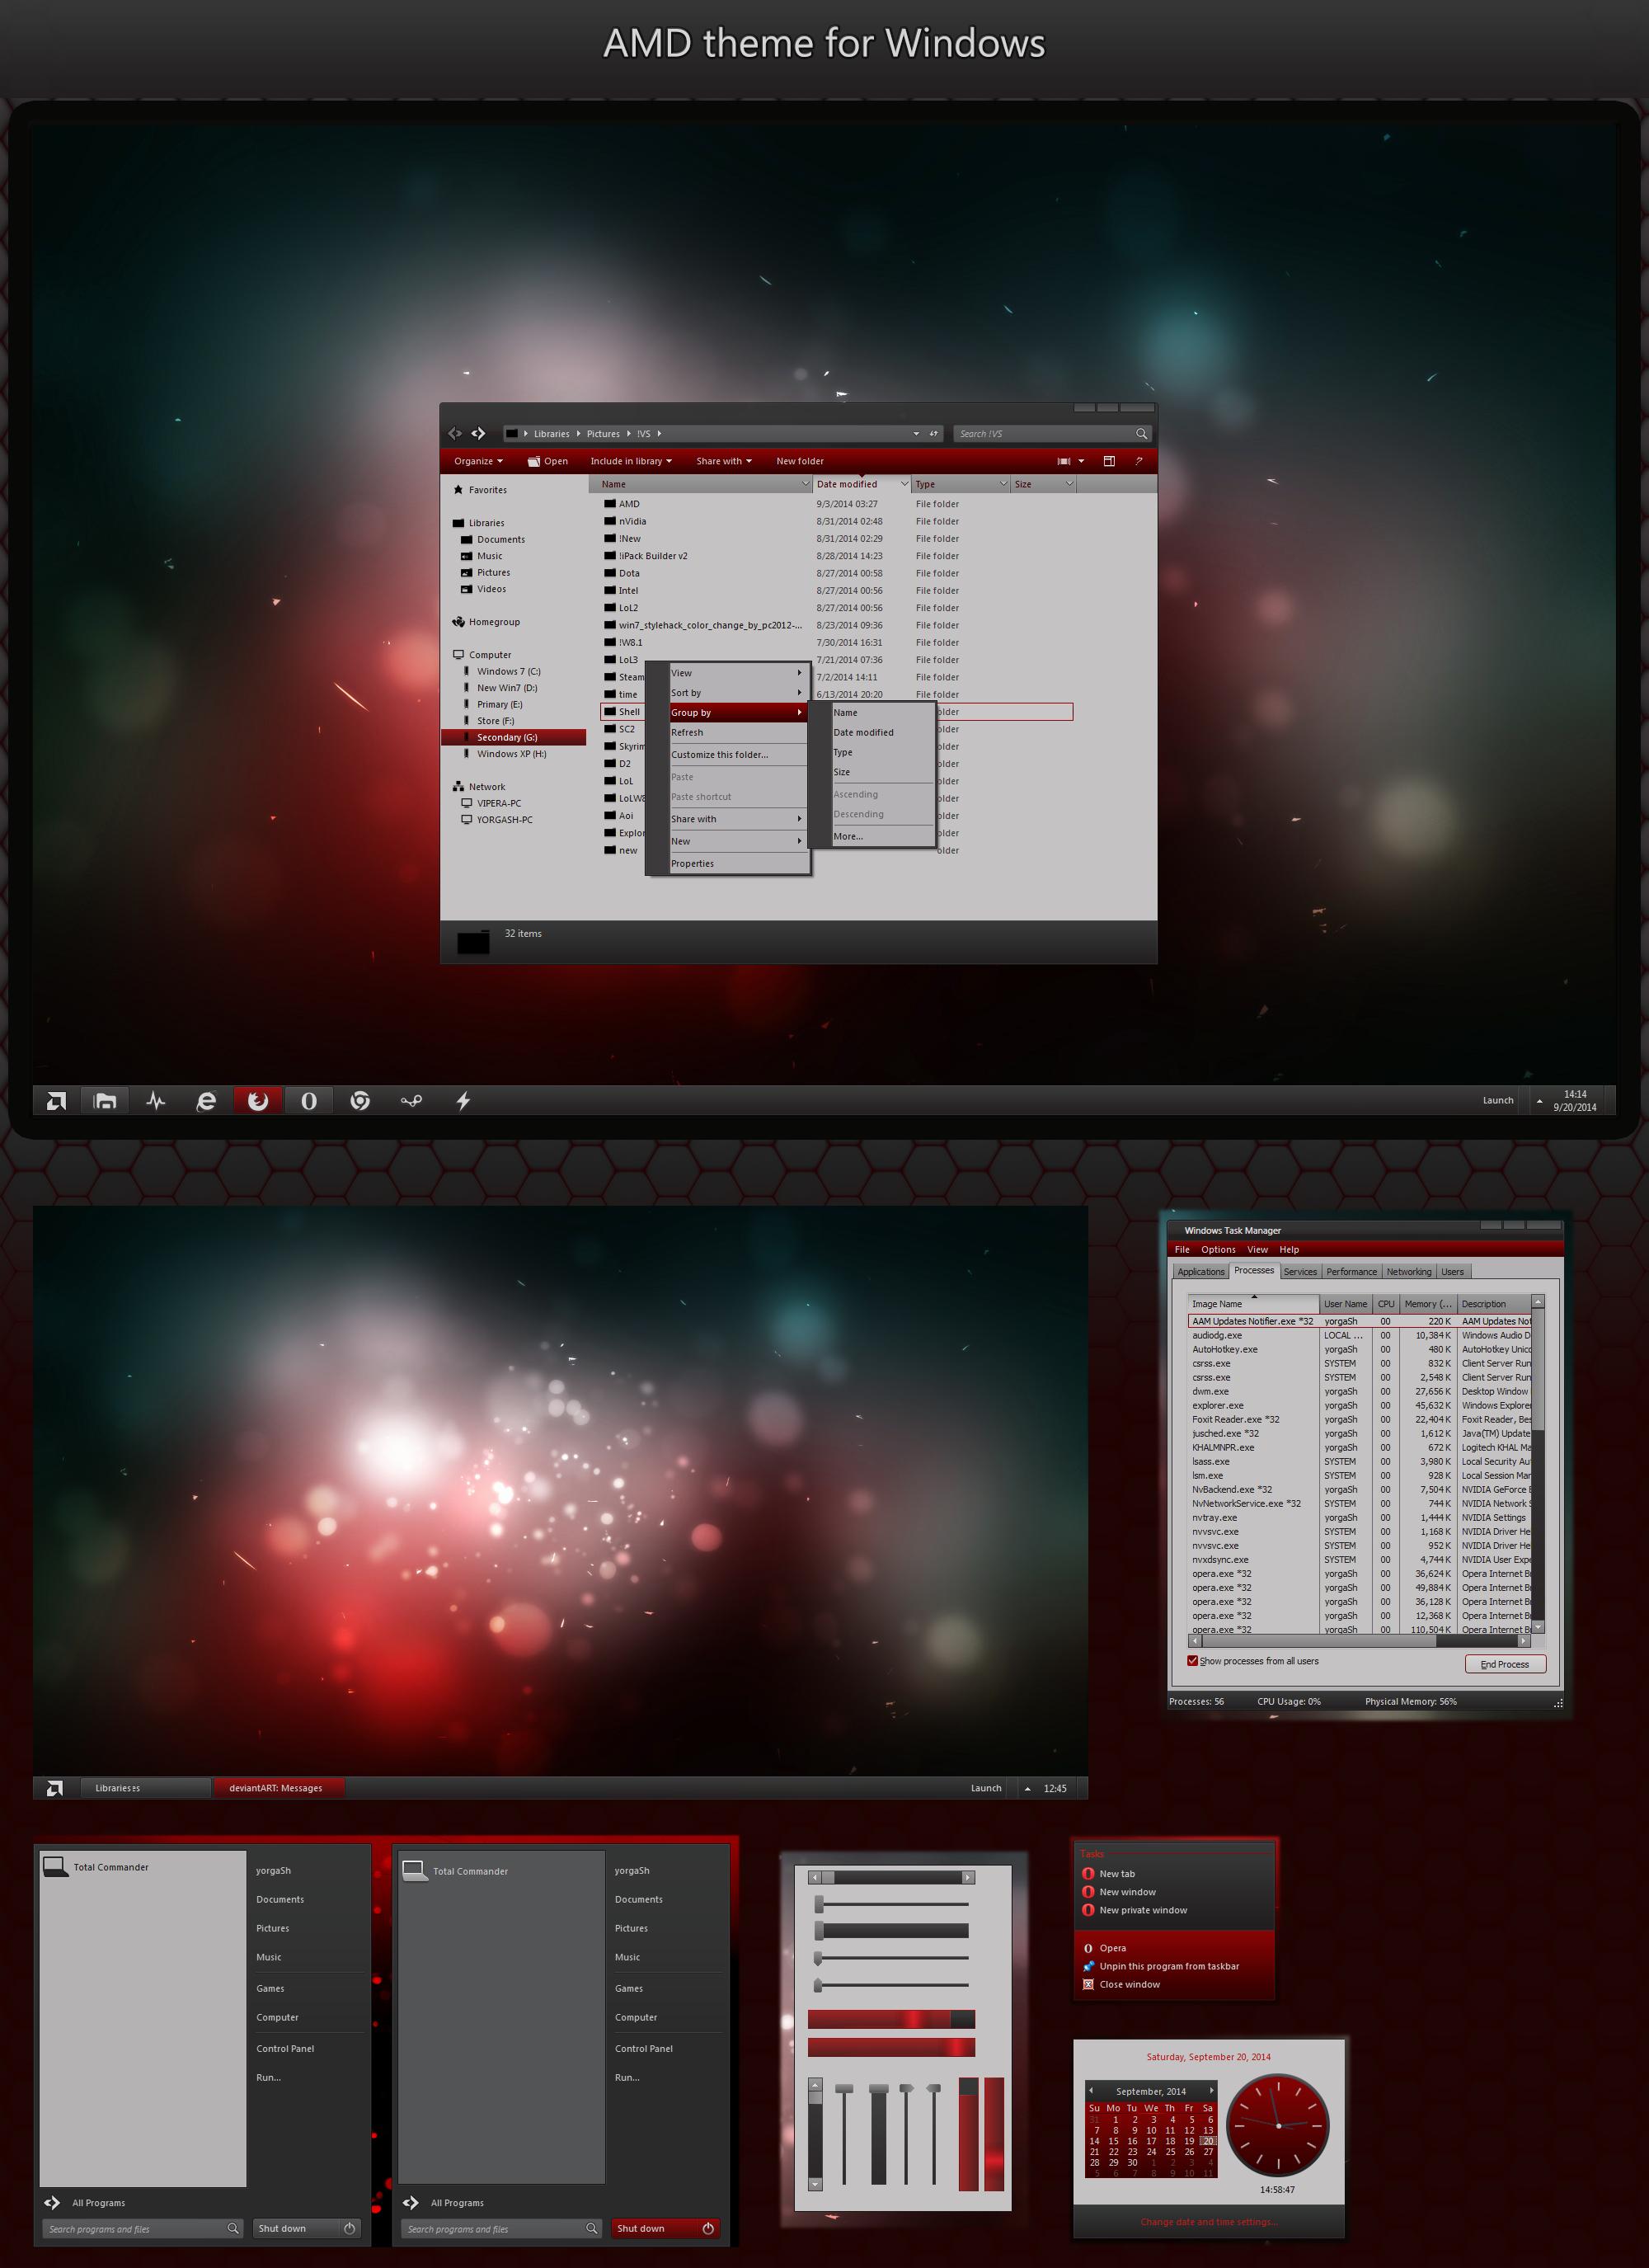 AMD Windows Desktop for Windows 7